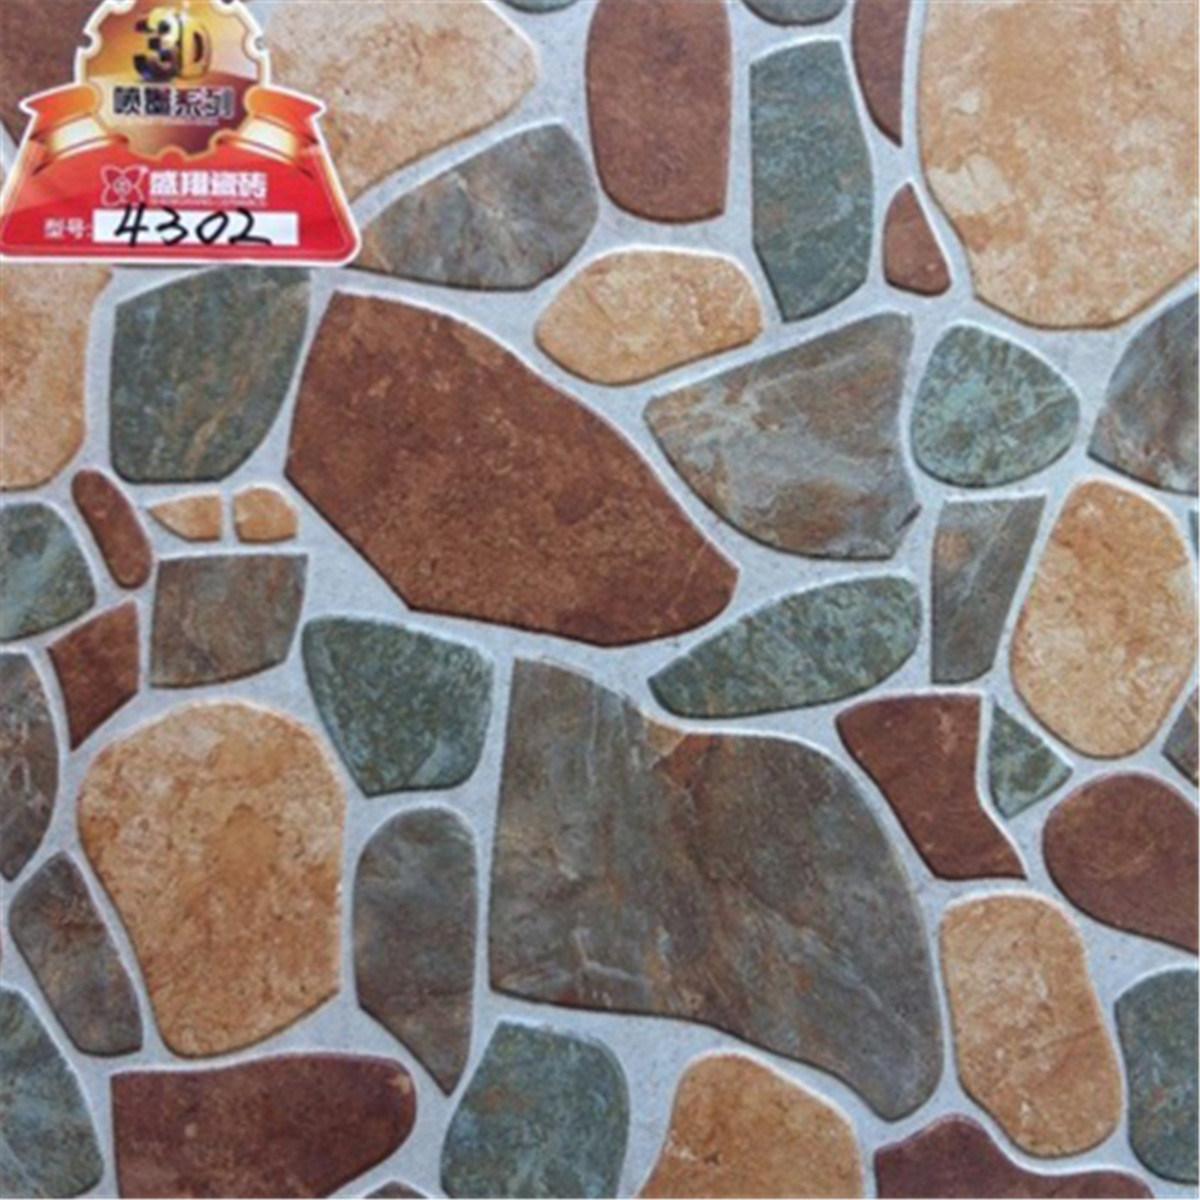 China 400400mm 3d ink jet print porcelain stone look floor tile china 400400mm 3d ink jet print porcelain stone look floor tile china porcelain floor tile porcelain stone floor tile dailygadgetfo Choice Image